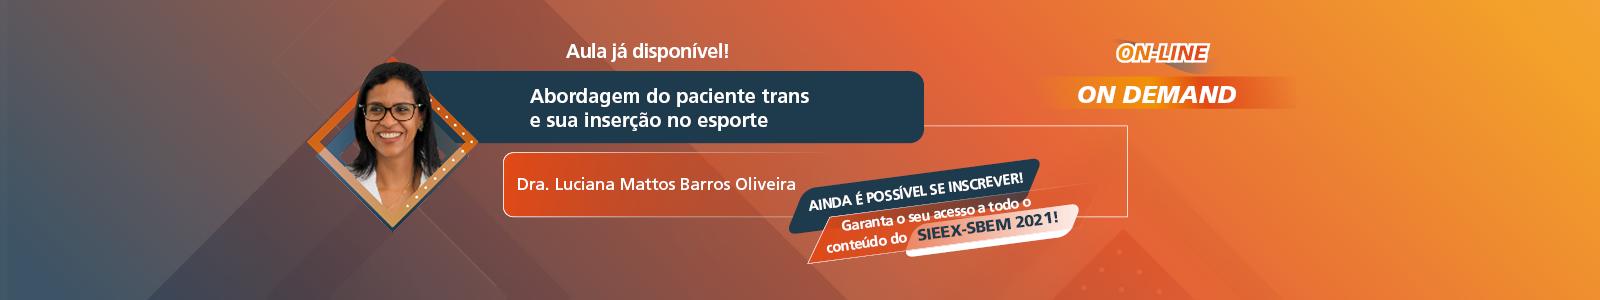 SIEEX banners on demand-Dra. Luciana Mattos Barros Oliveira 3 (1)